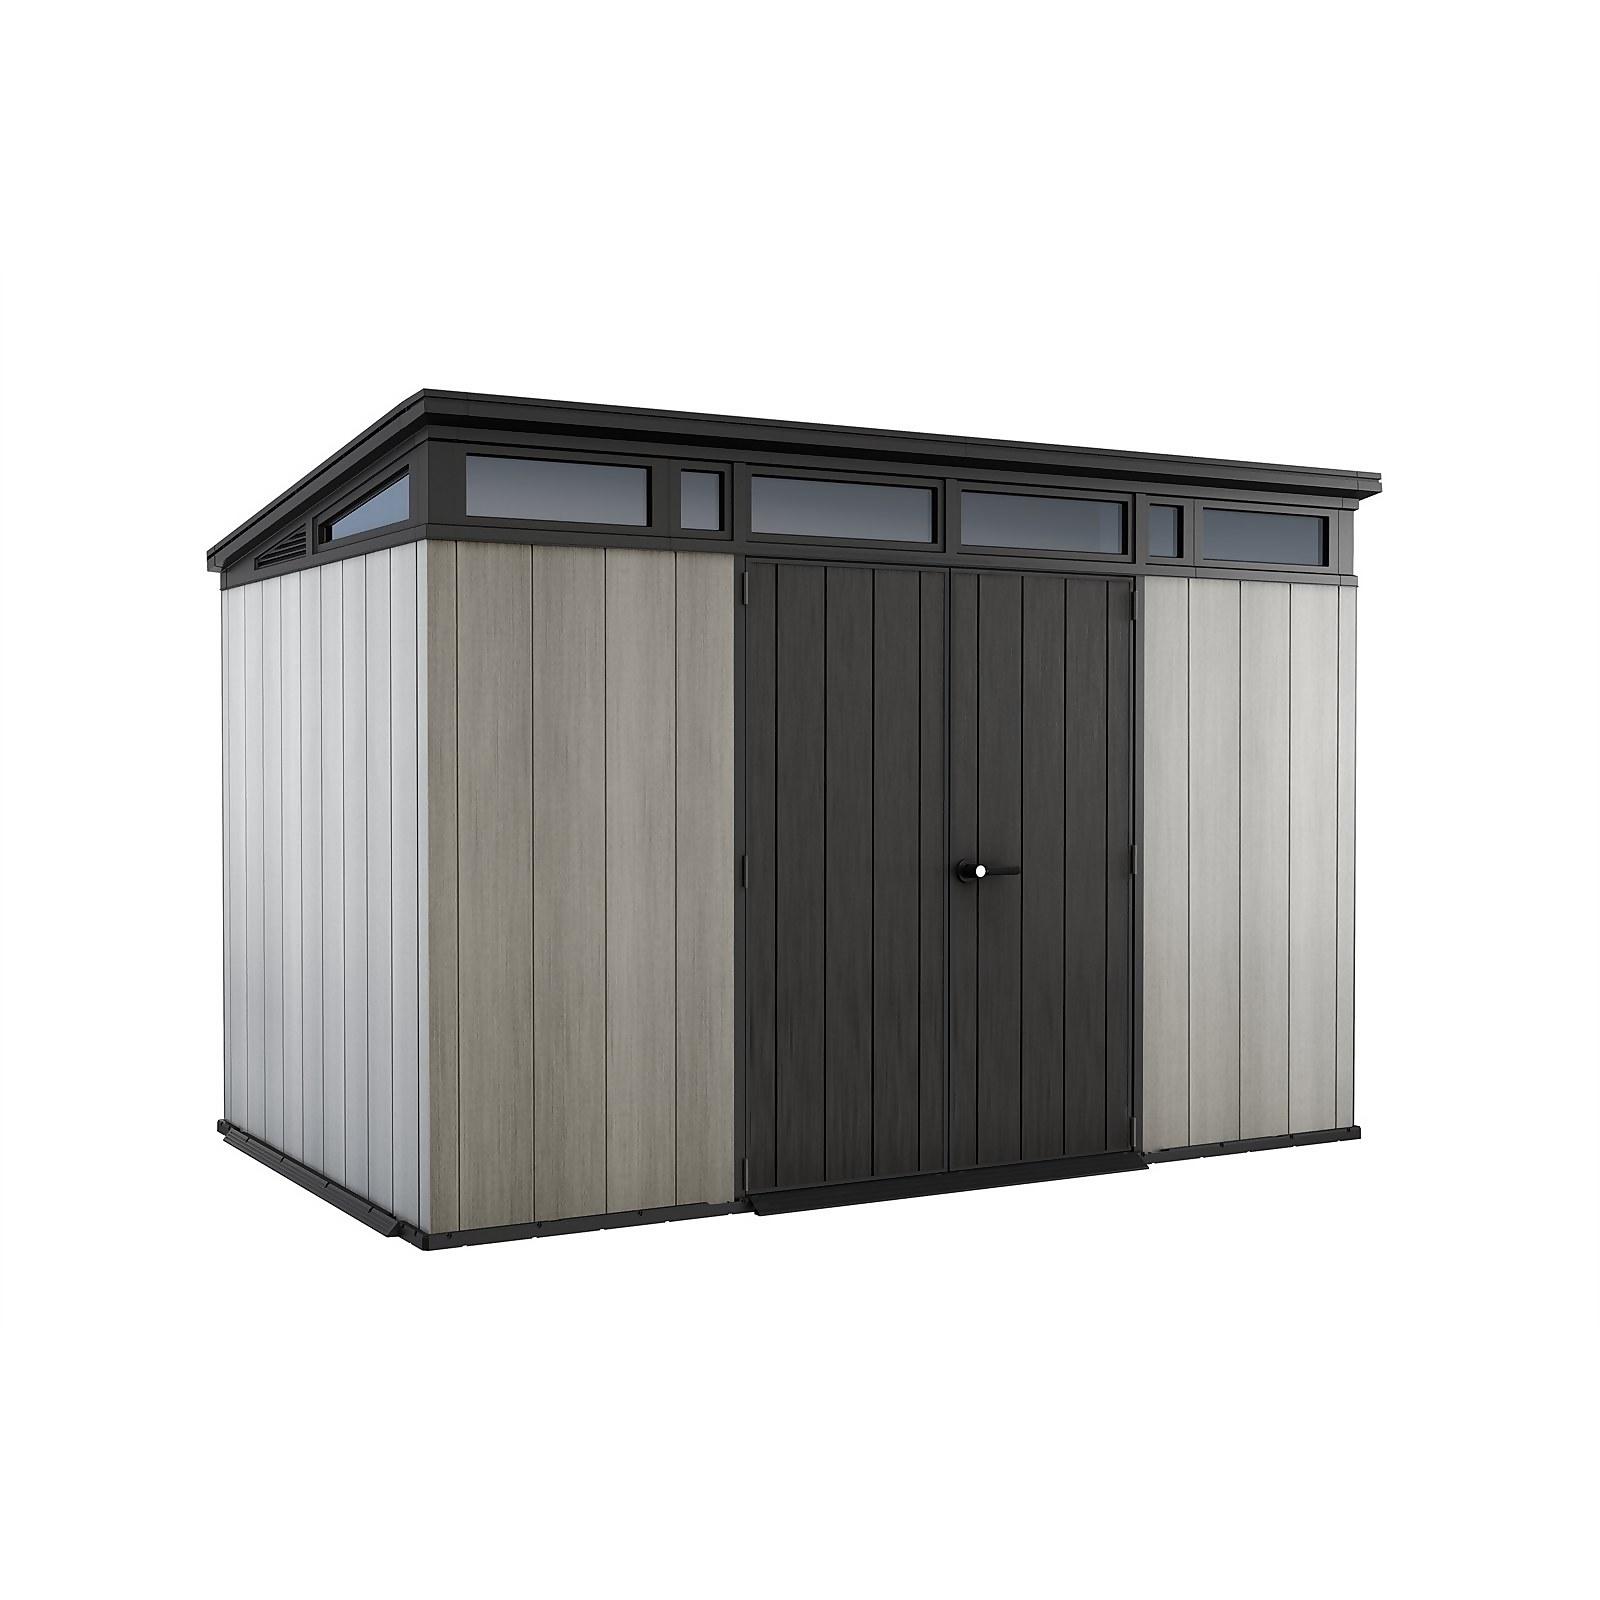 Keter Artisan 11x7ft Outdoor Plastic Garden Storage Pent Shed - Grey